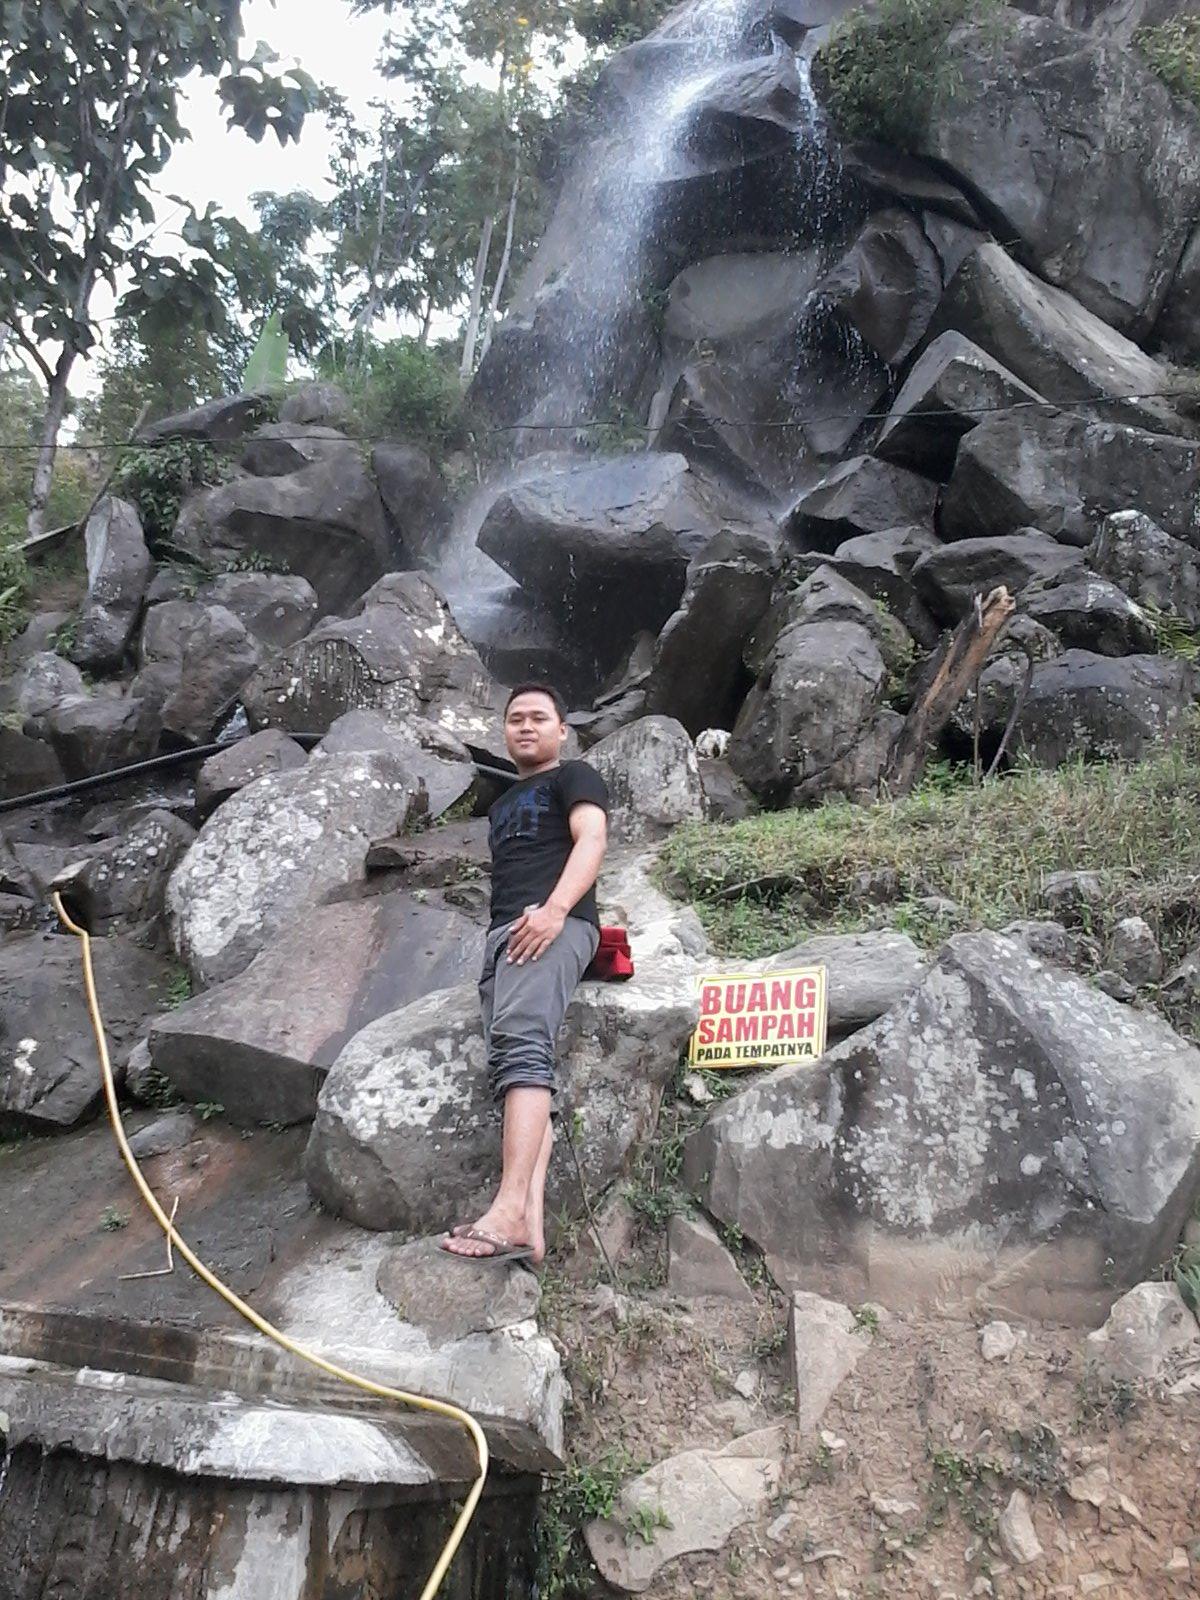 Danang Sutowijoyo 2015 Masuk Wisata Watu Jonggol Cukup Membayar Tiket